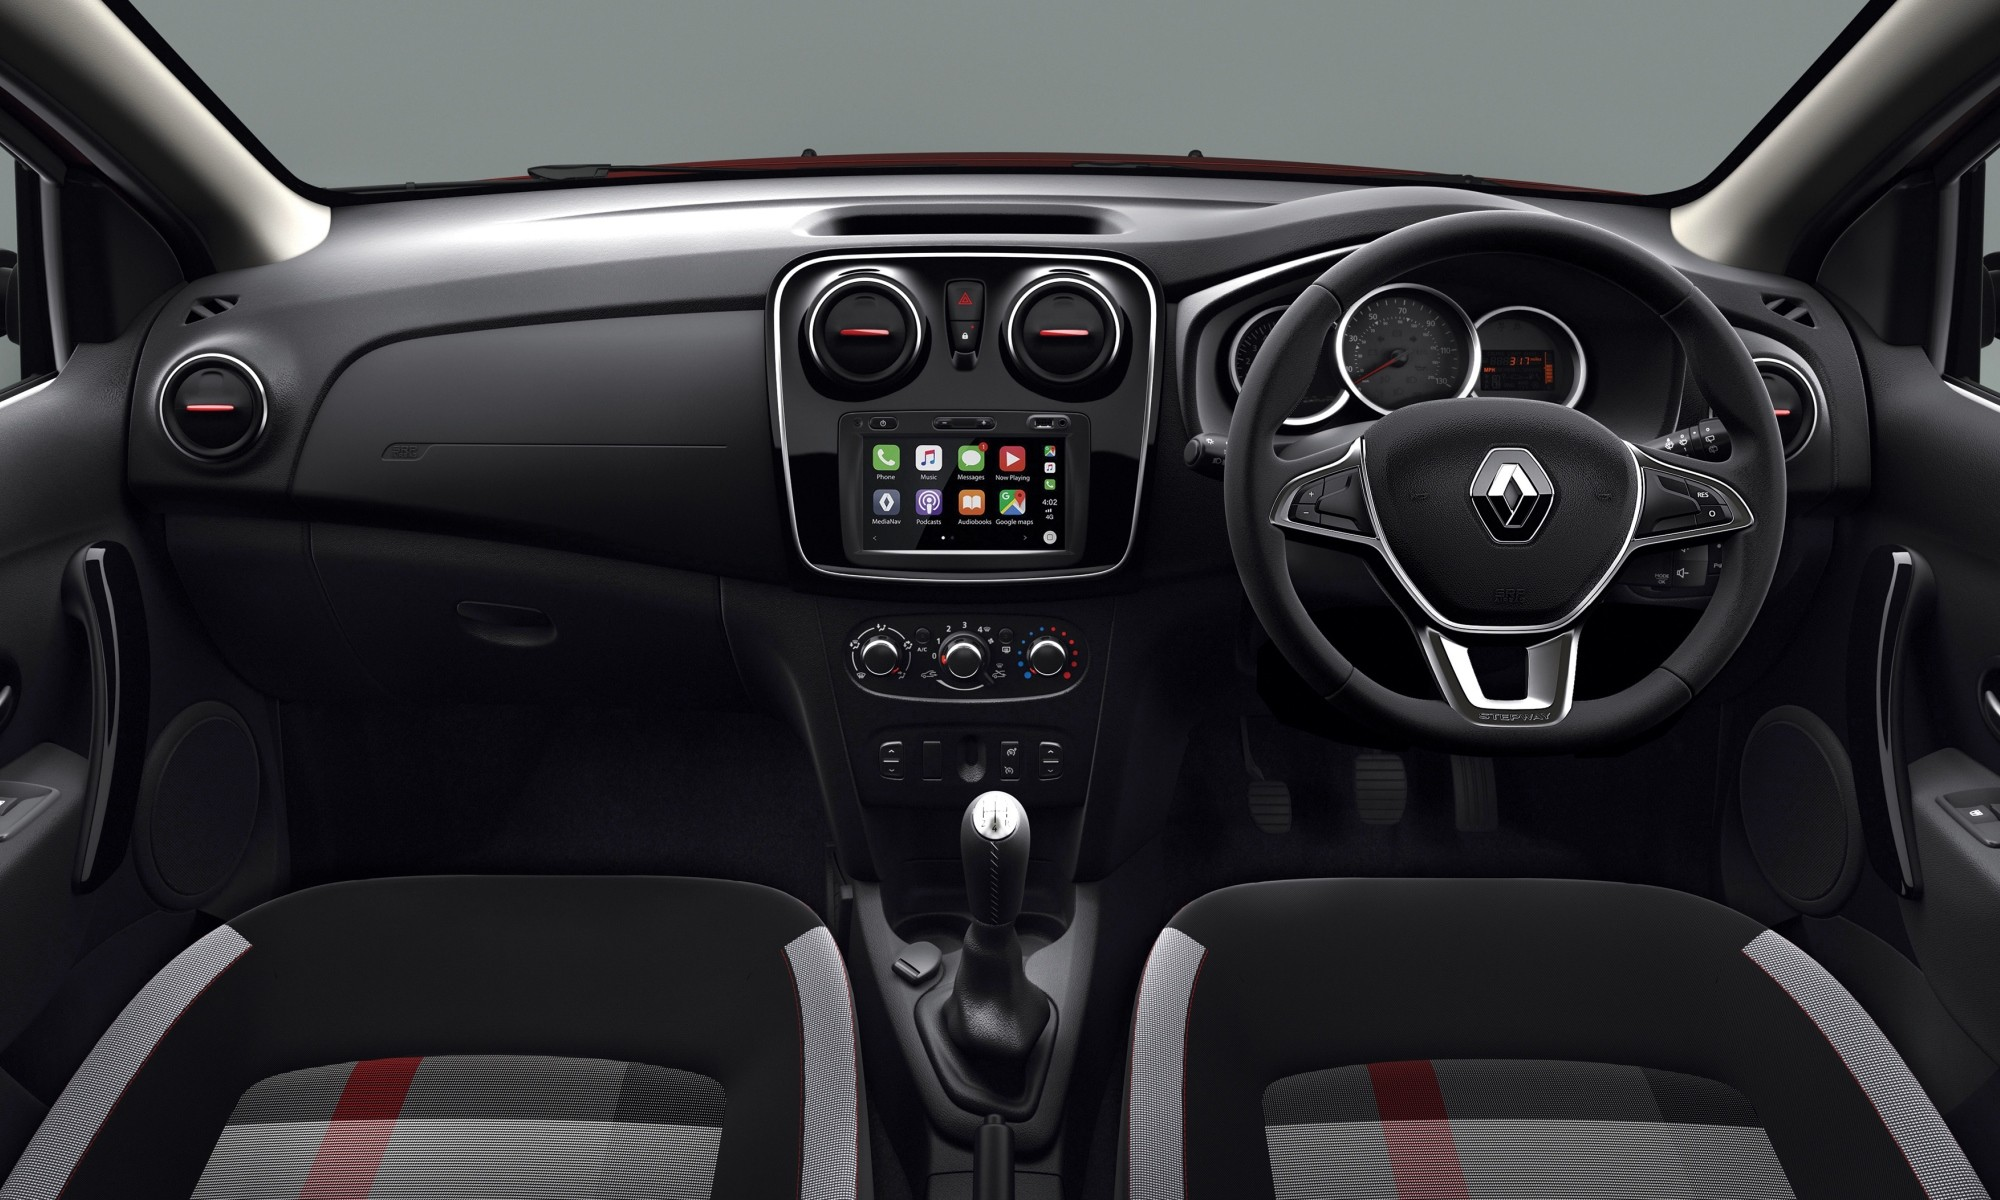 Renault Sandero Stepway Plus interior